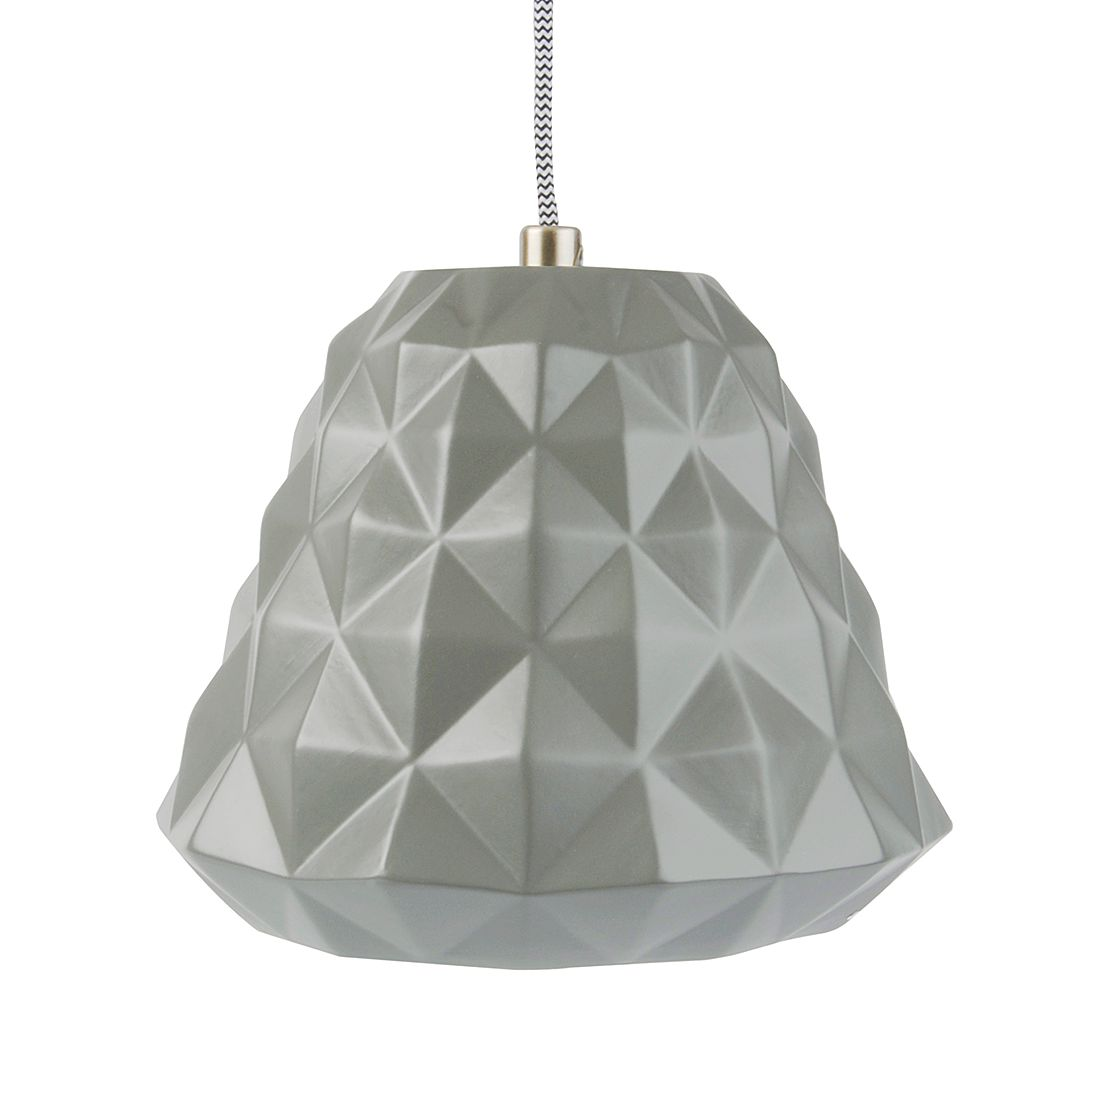 EEK A++, Hängeleuchte Cast Mini – Keramik Grau, Leitmotiv kaufen